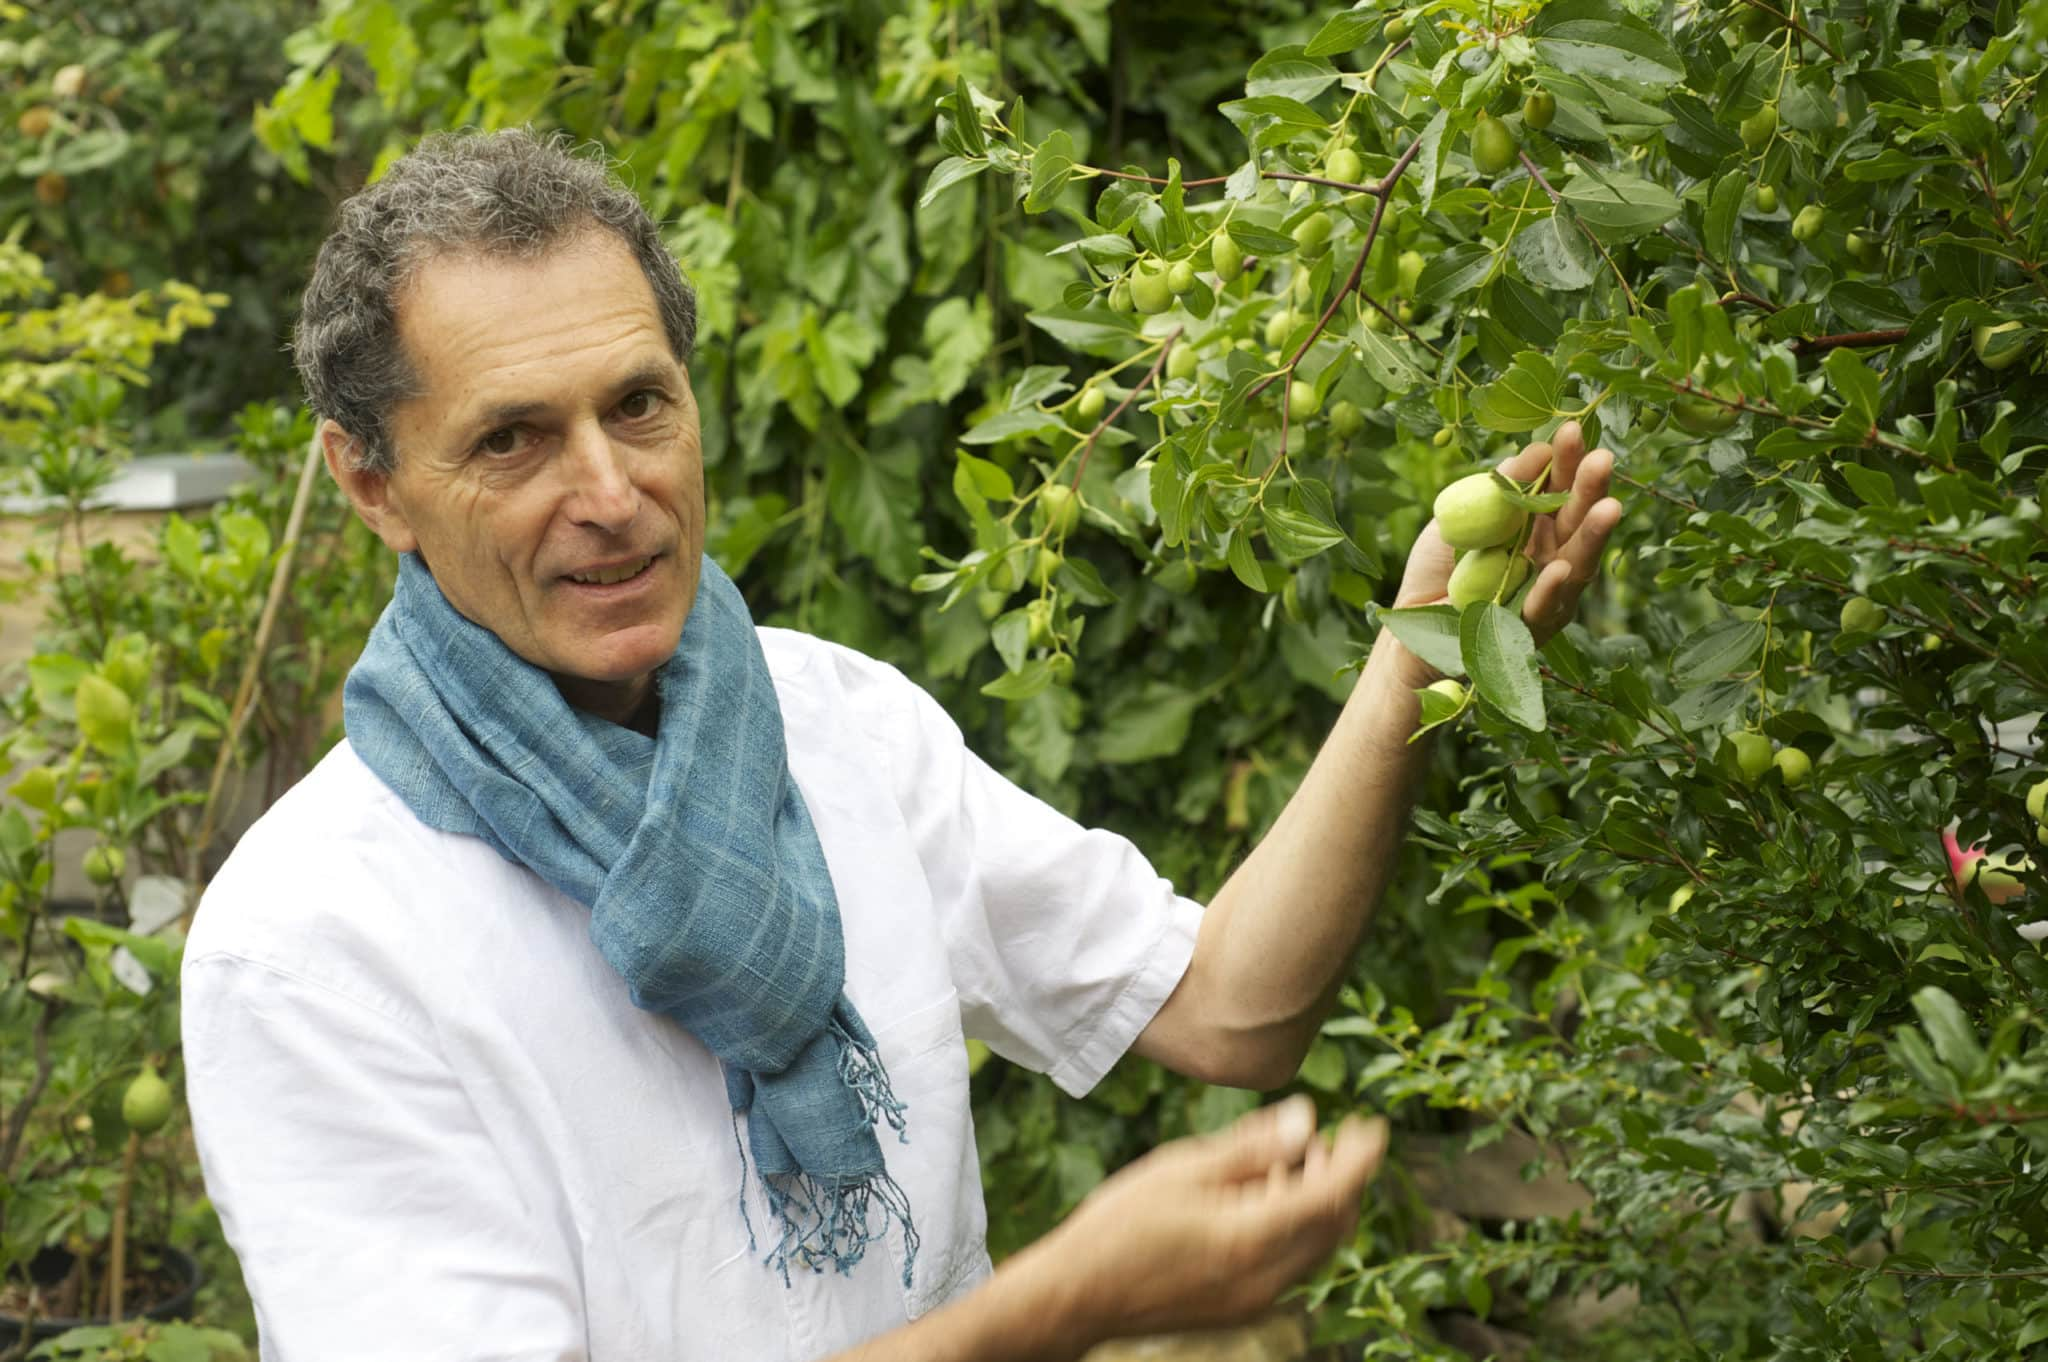 Siegfried Tatschl - Naturgärtner, Organisationsberater, Supervisor, Psychotherapeut sowie Permakulturpionier.